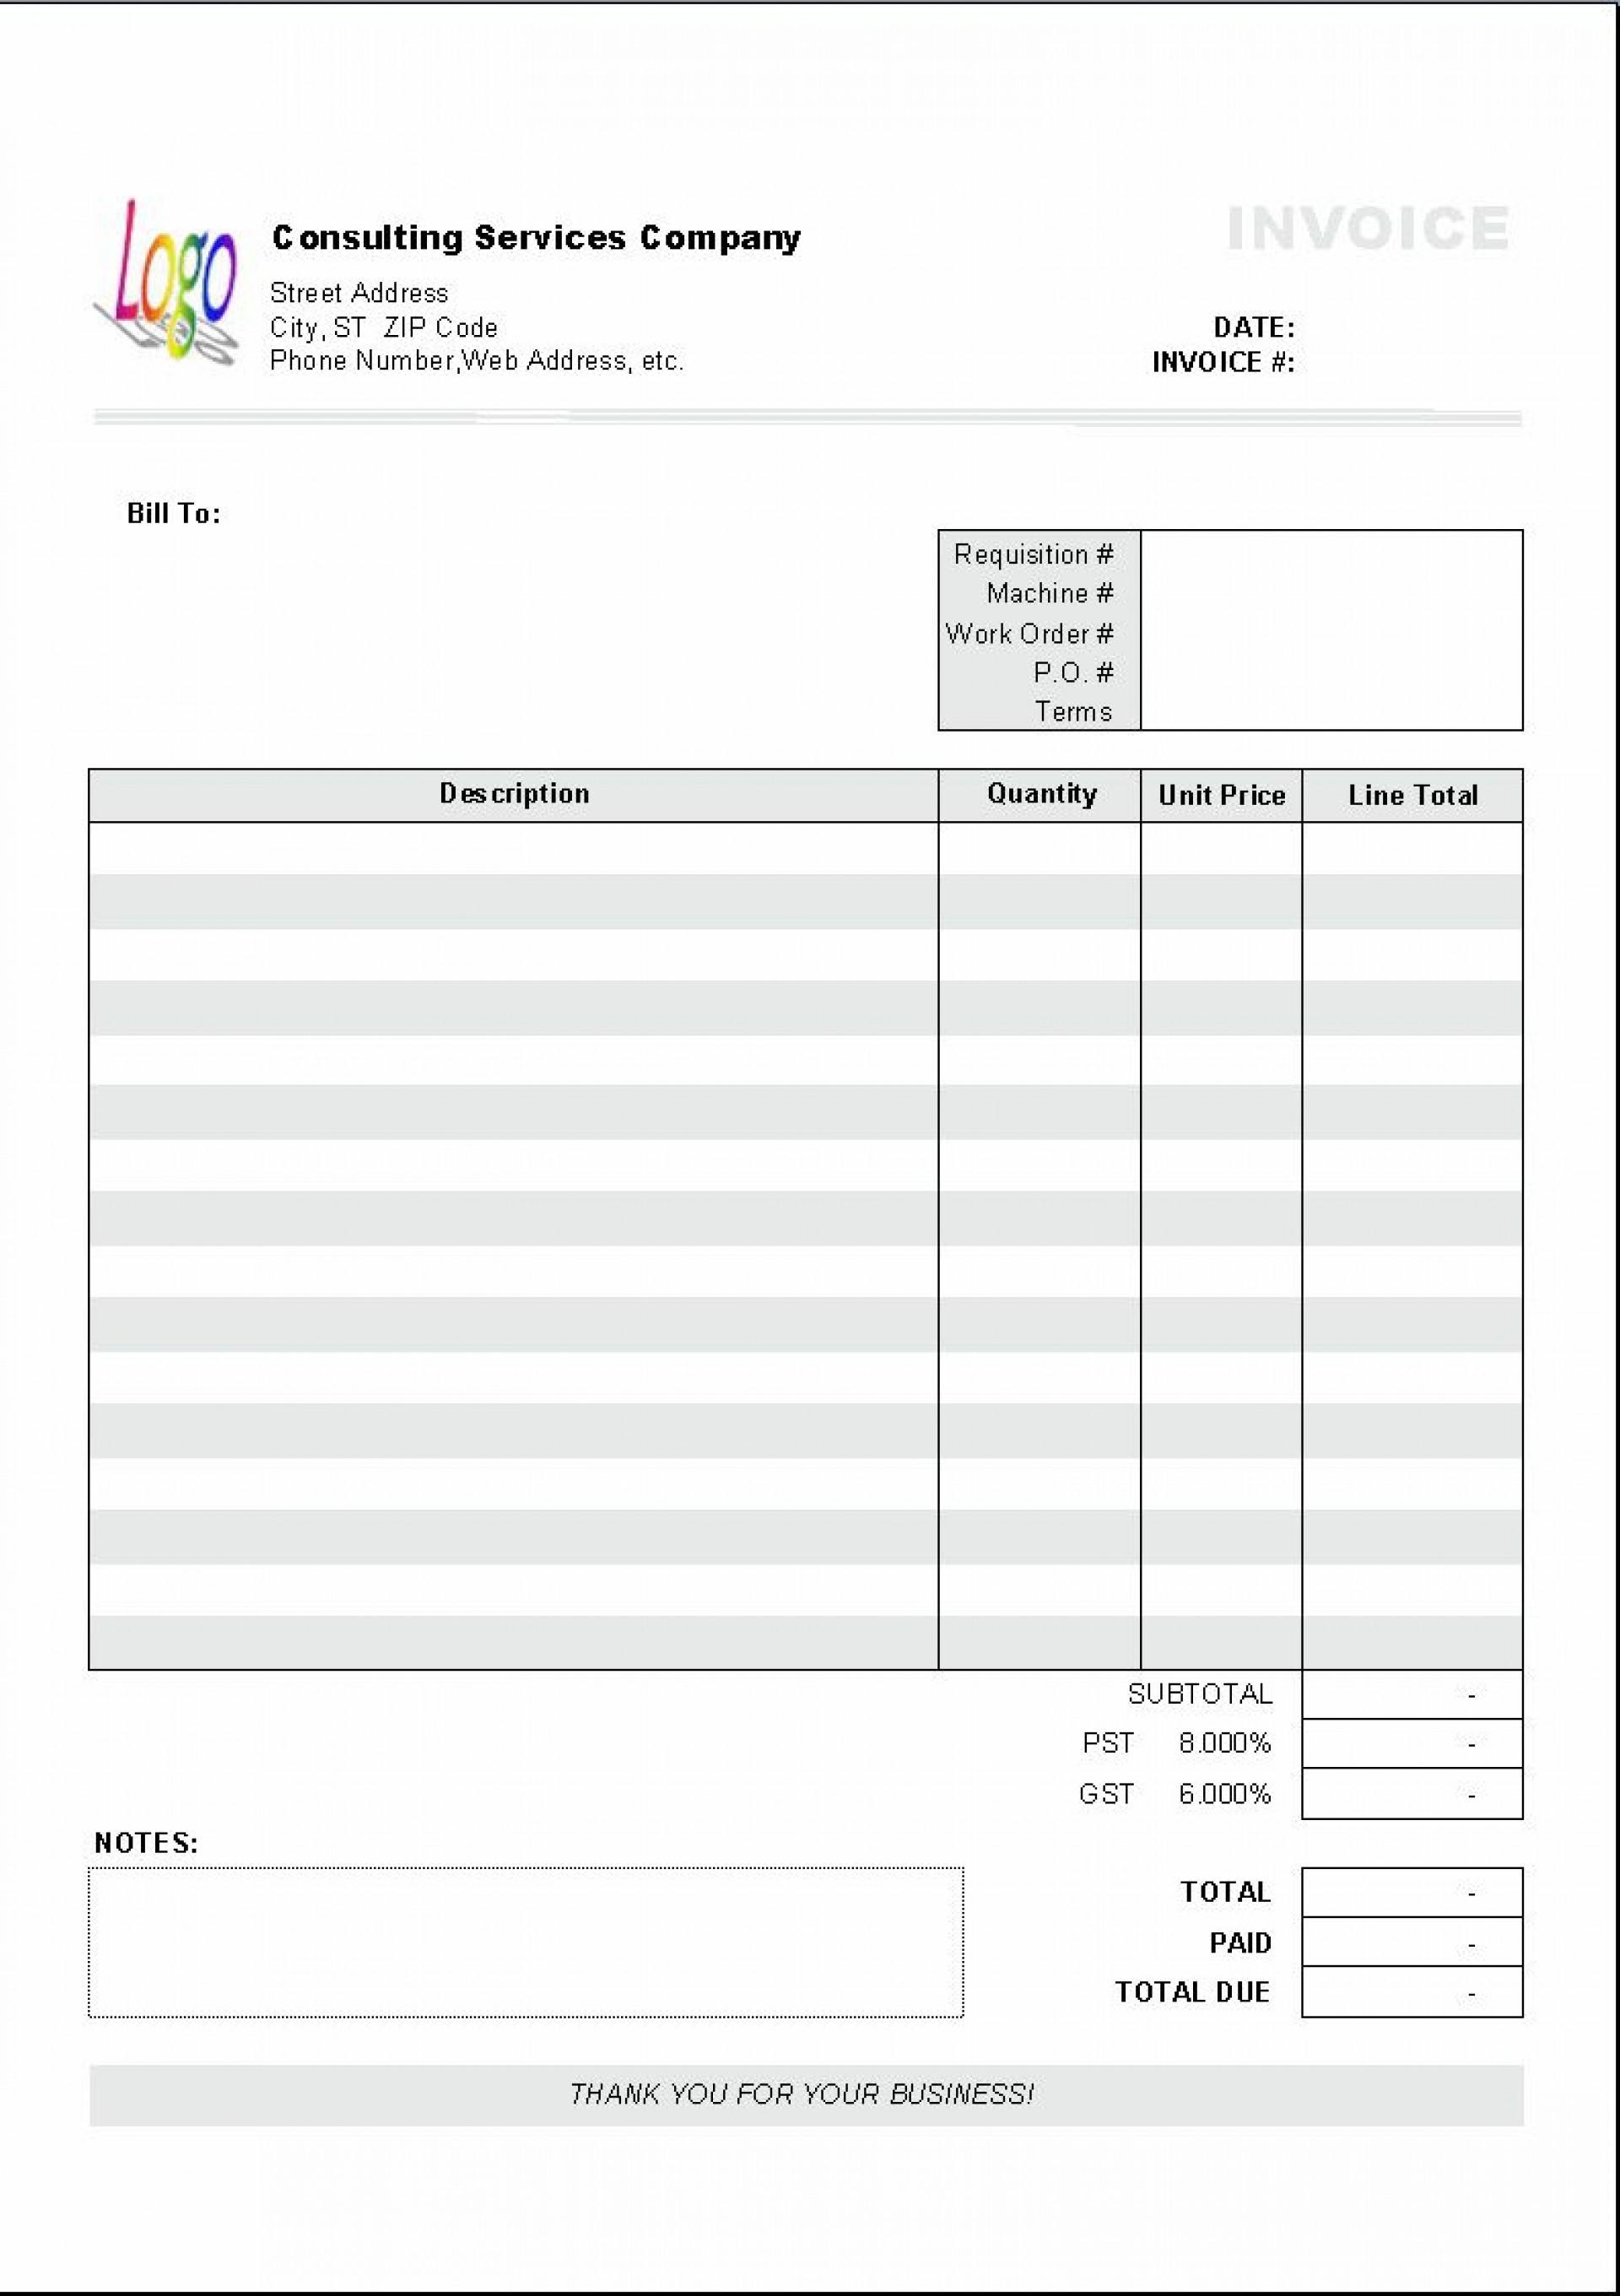 002 Stupendou Free Printable Tax Invoice Template Australia High Definition 1920